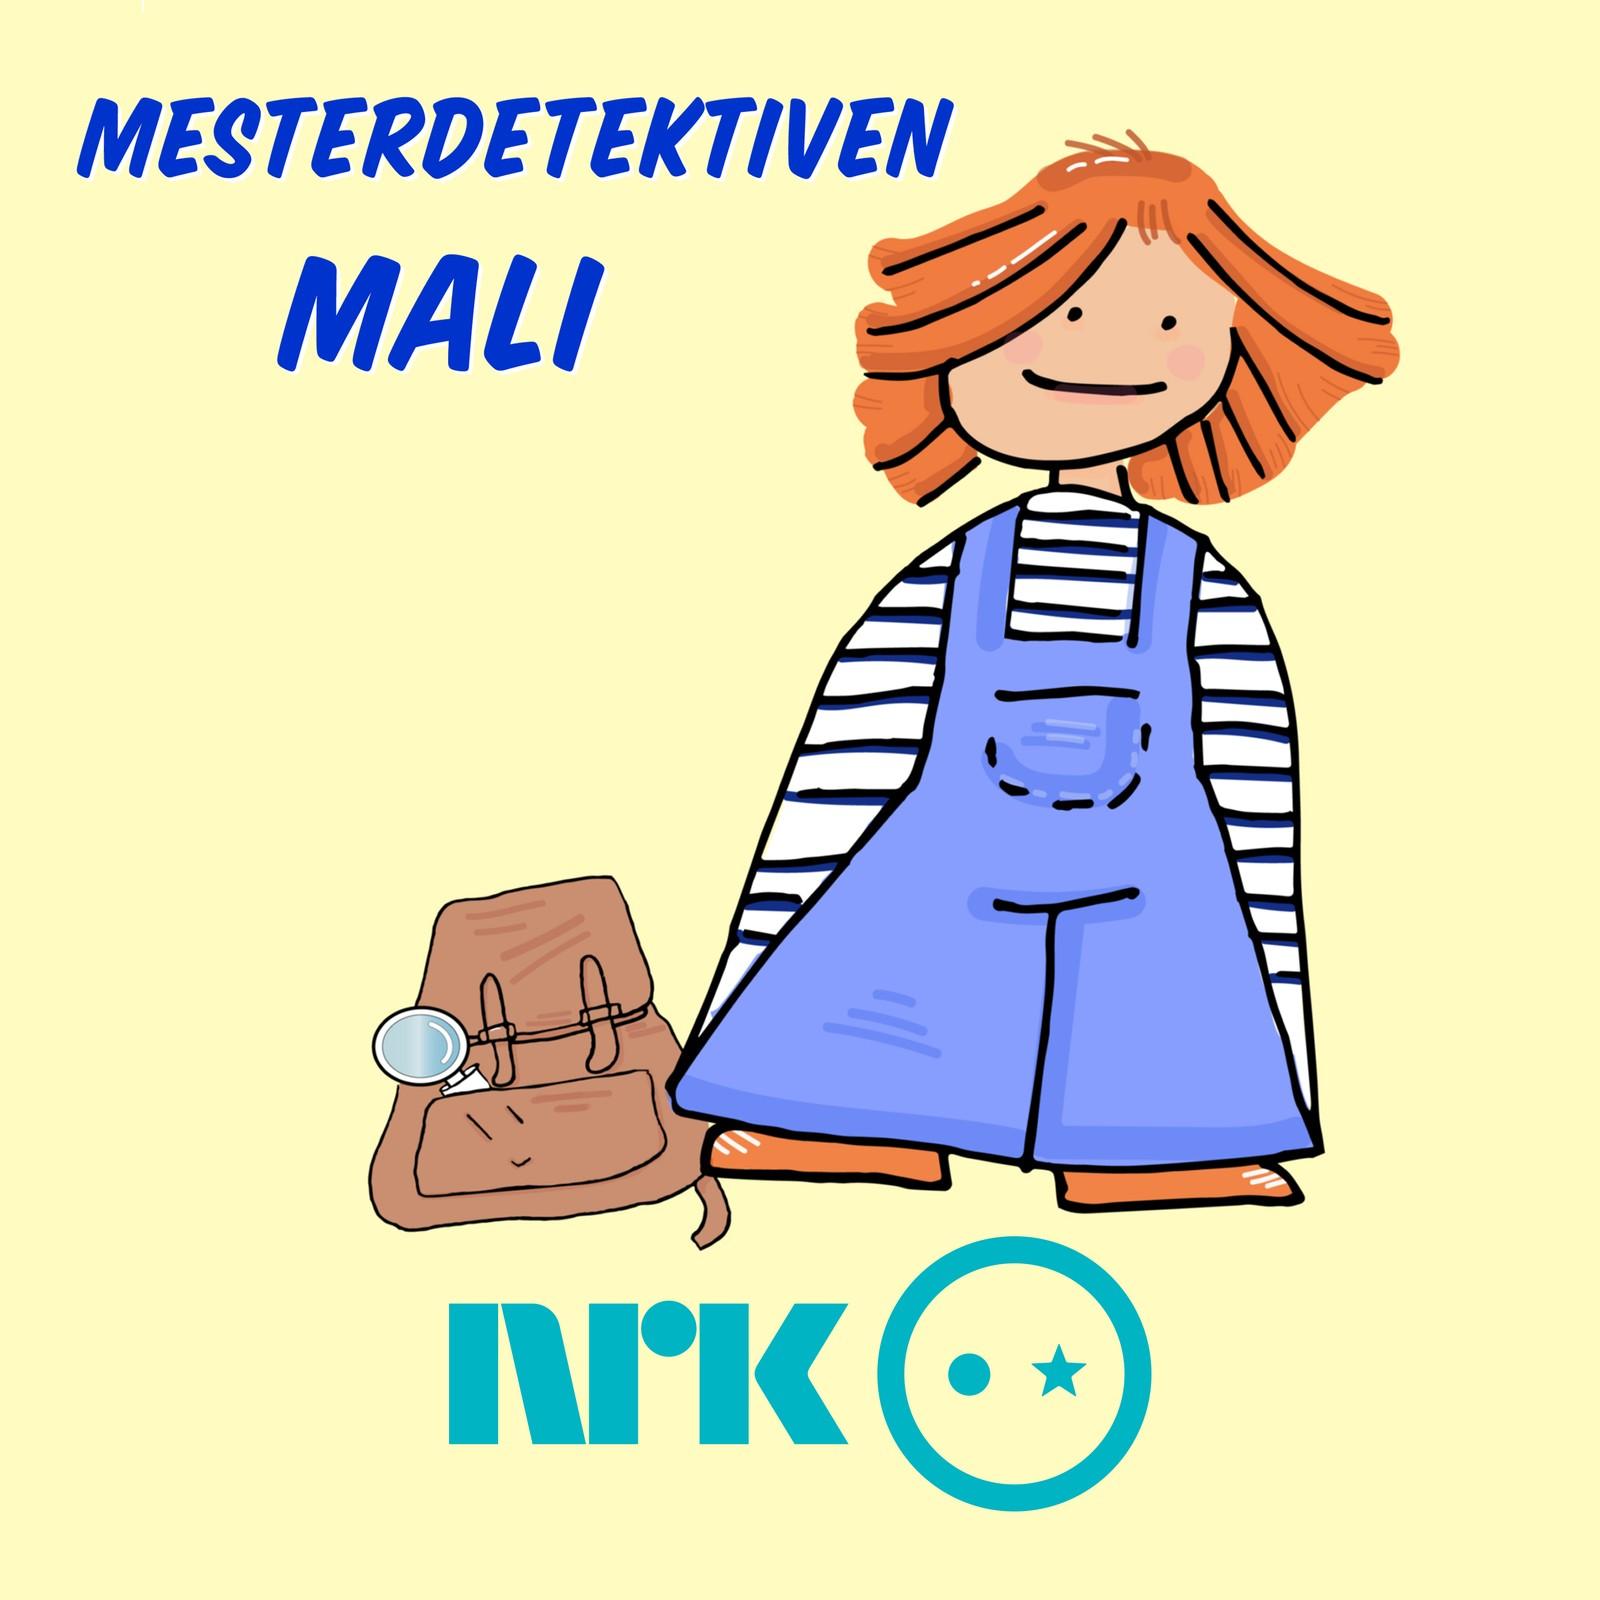 Mesterdetektiven Mali